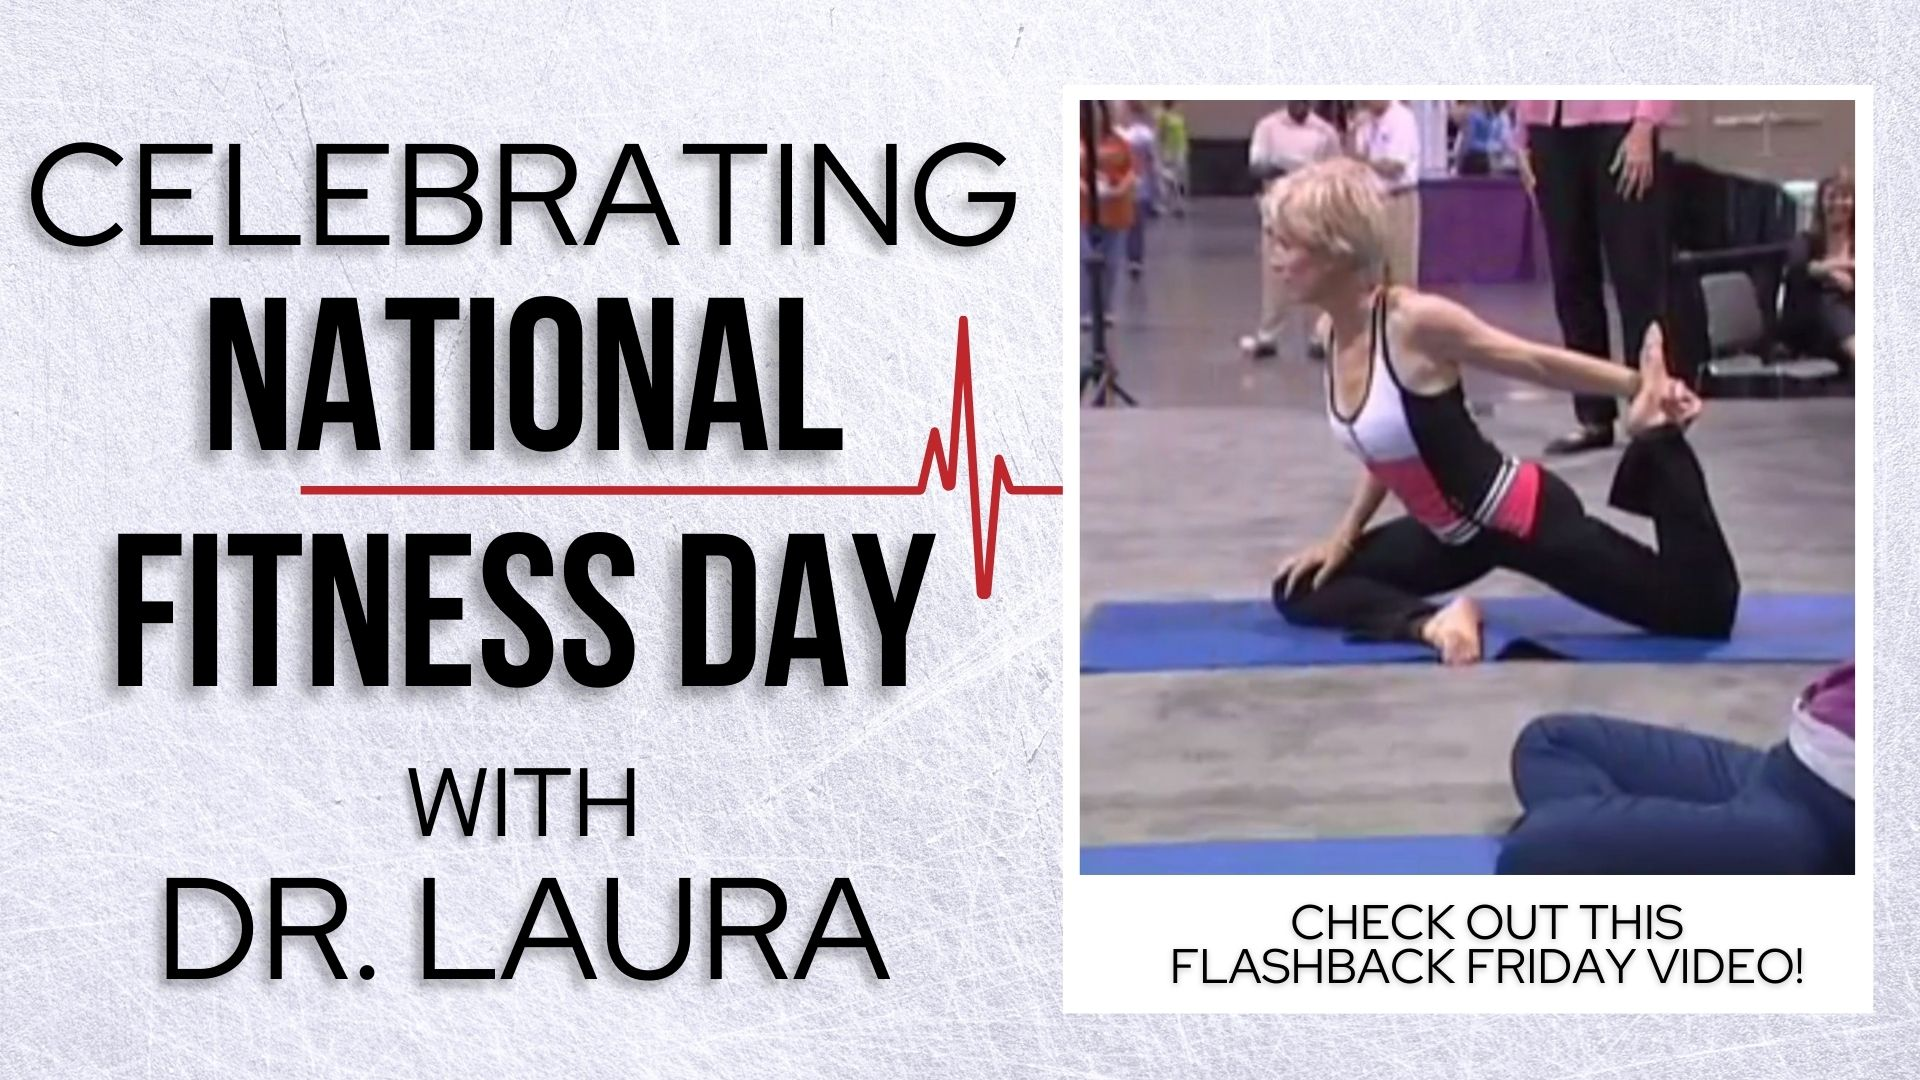 YouTube: Celebrating National Fitness Day